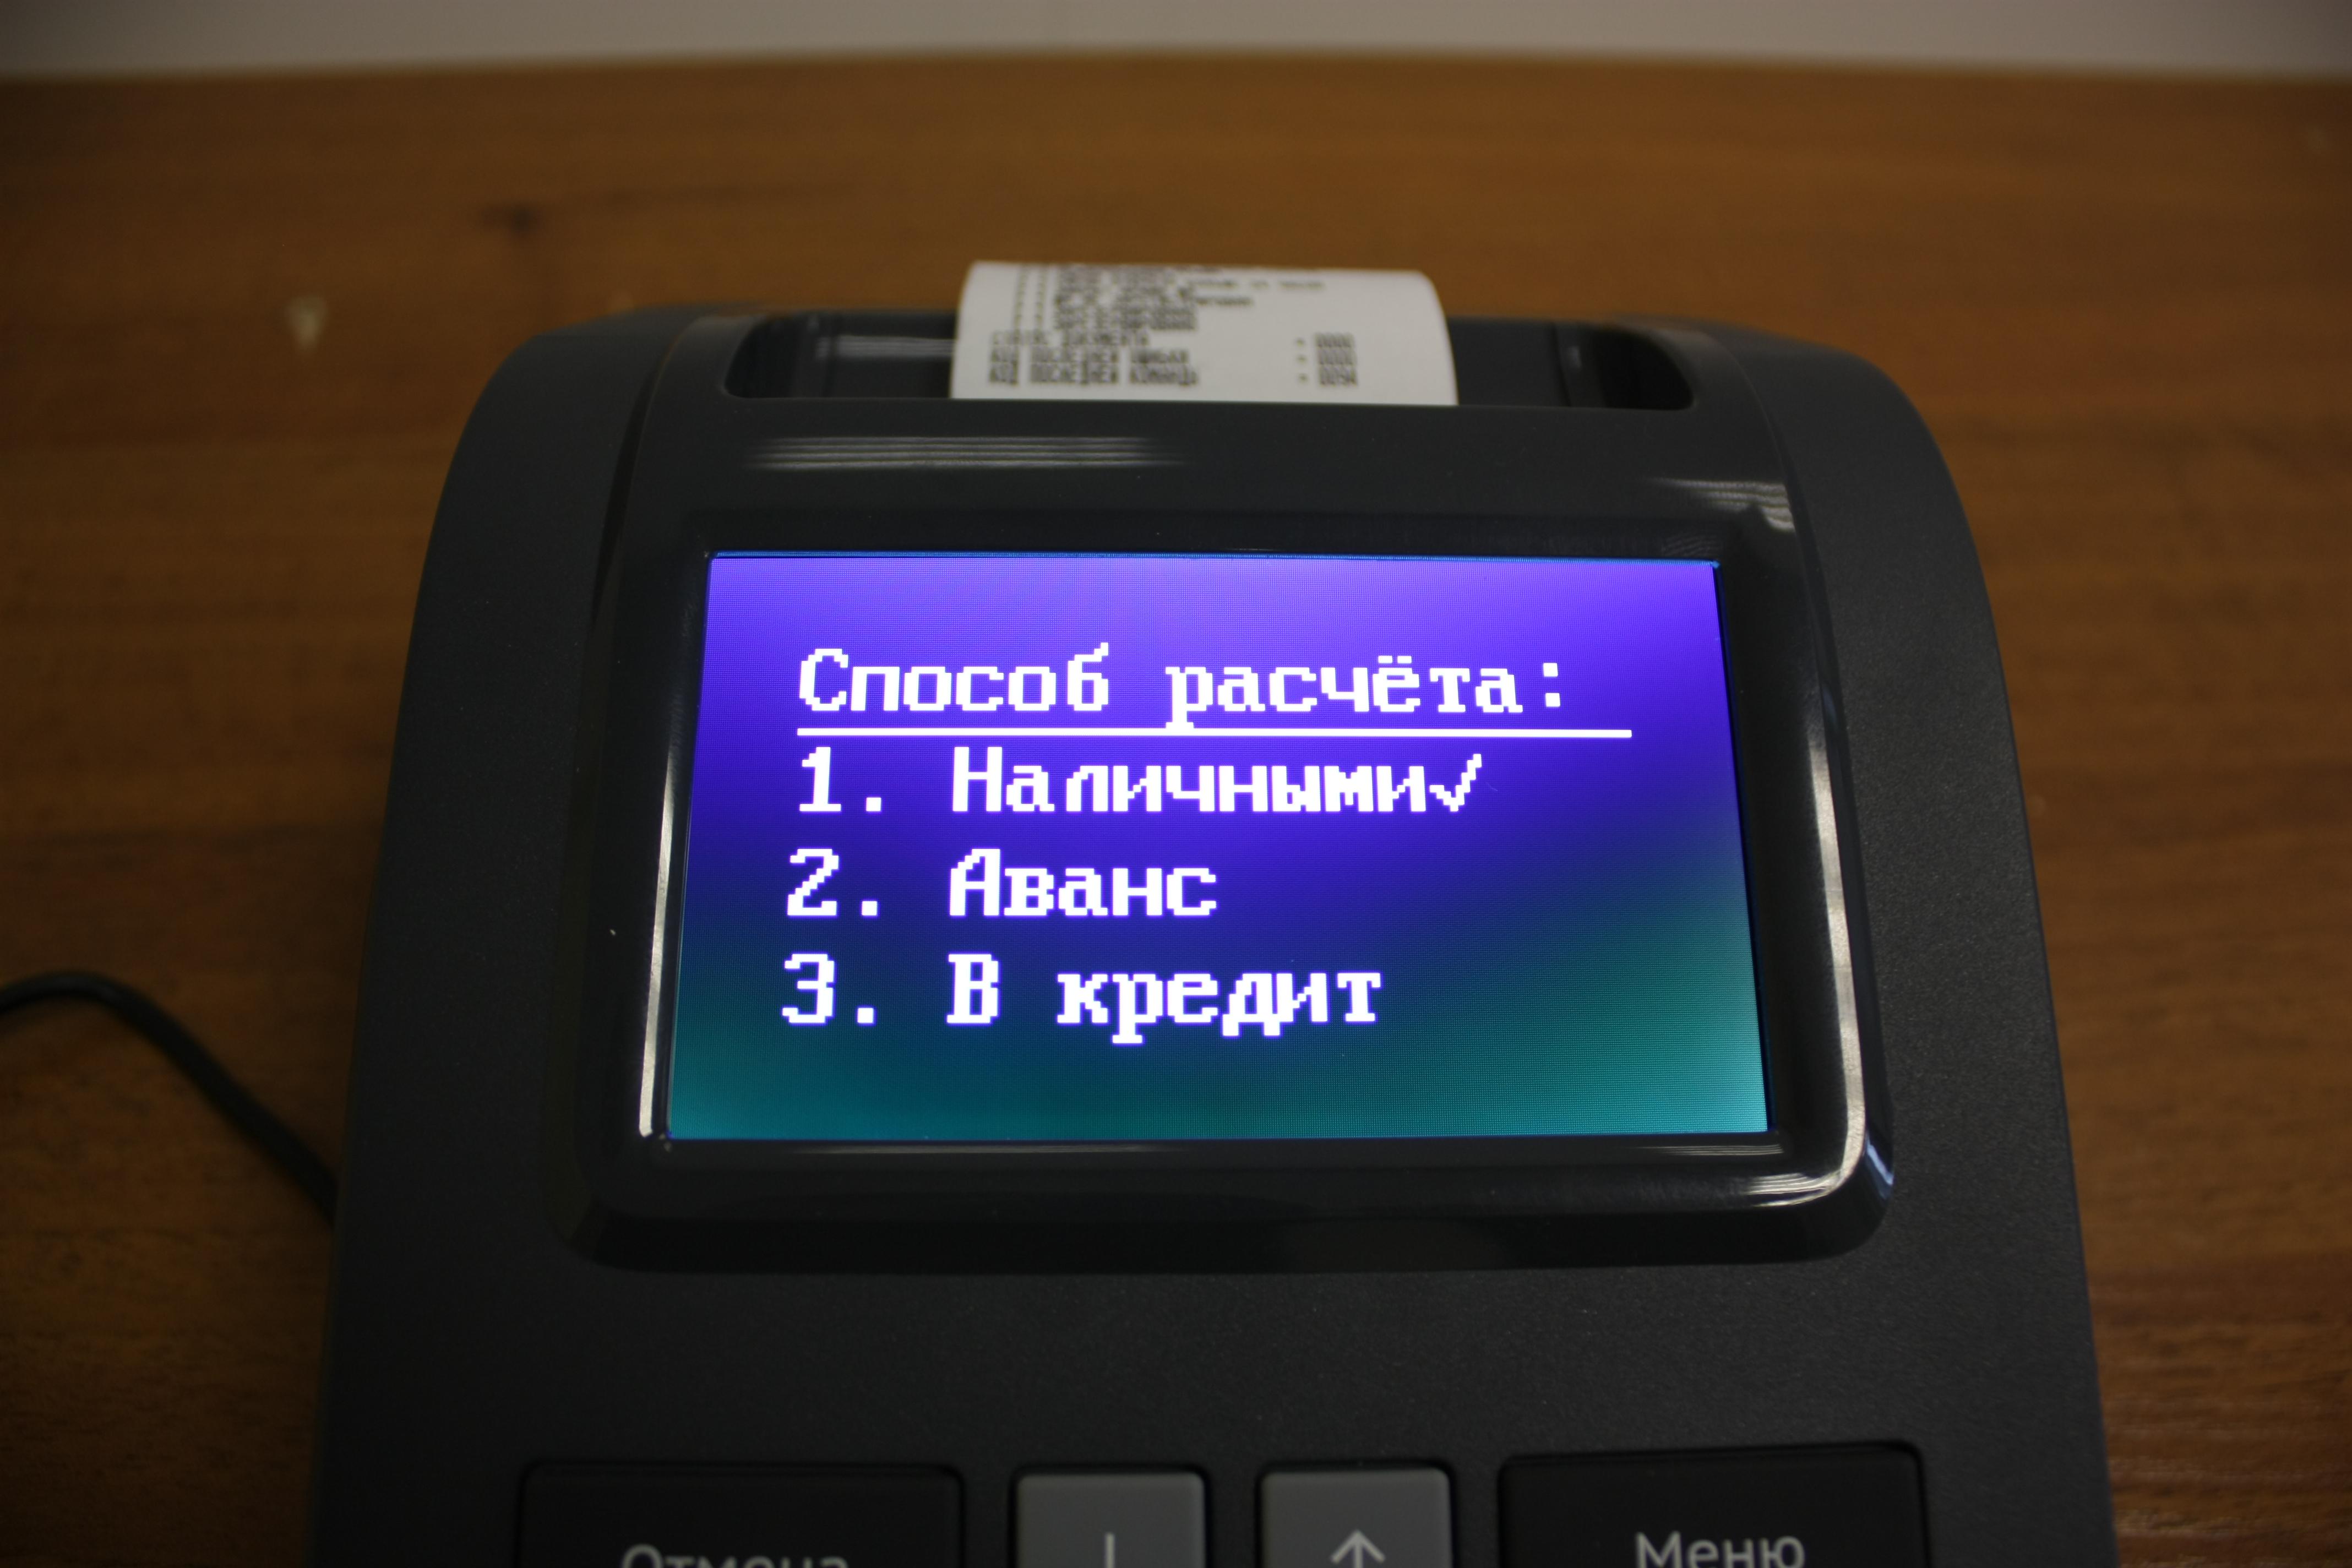 Кредит касса телефон